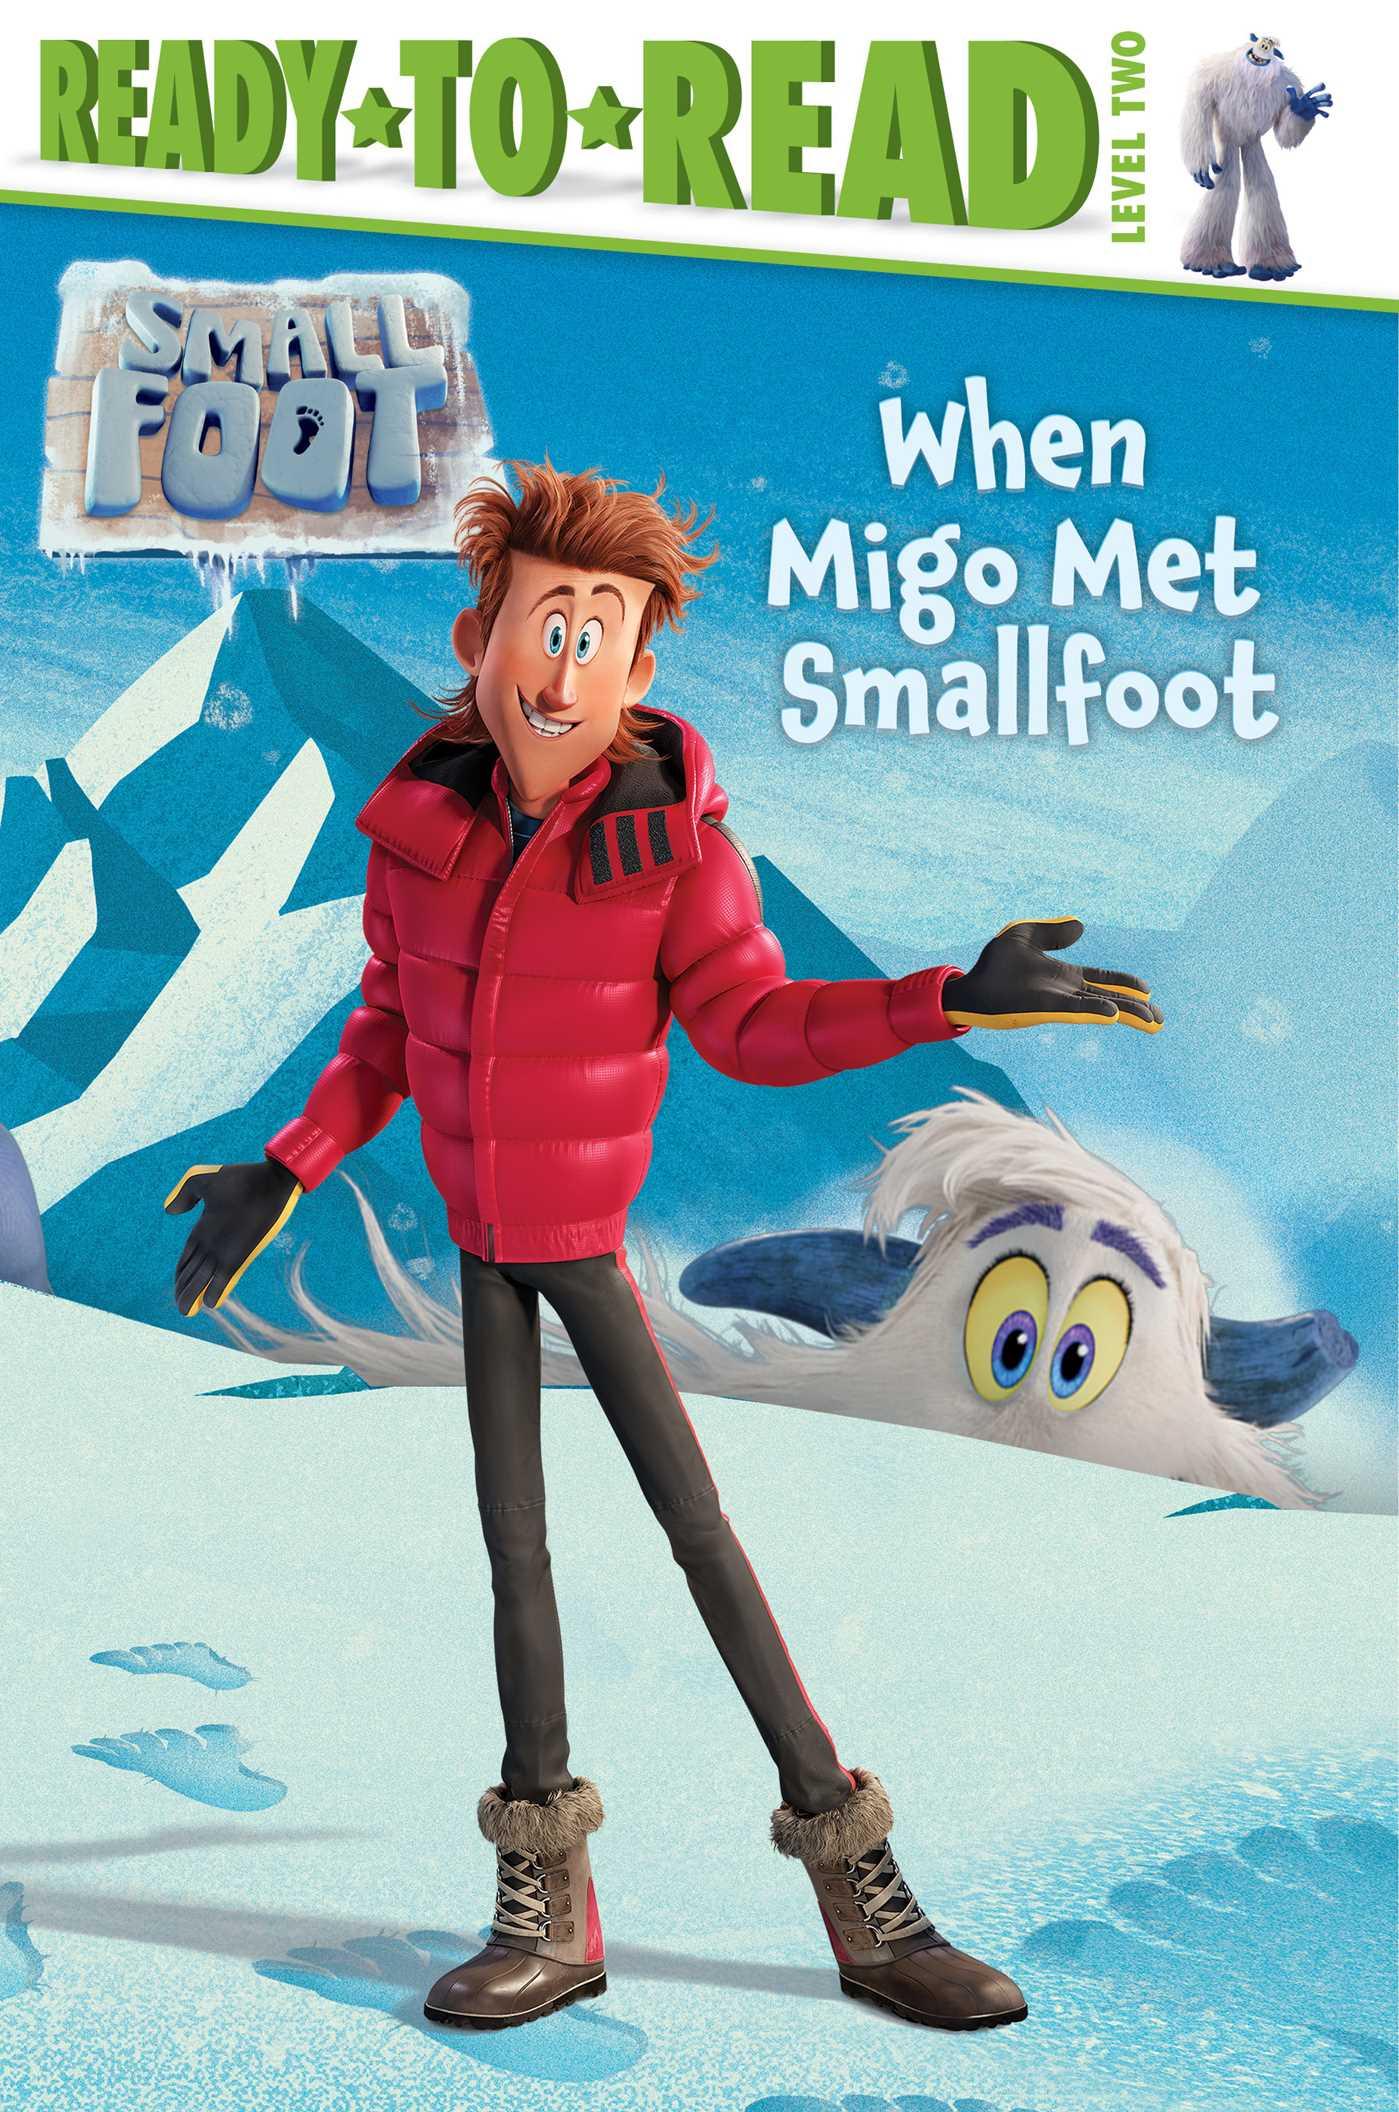 When migo met smallfoot 9781534431720 hr